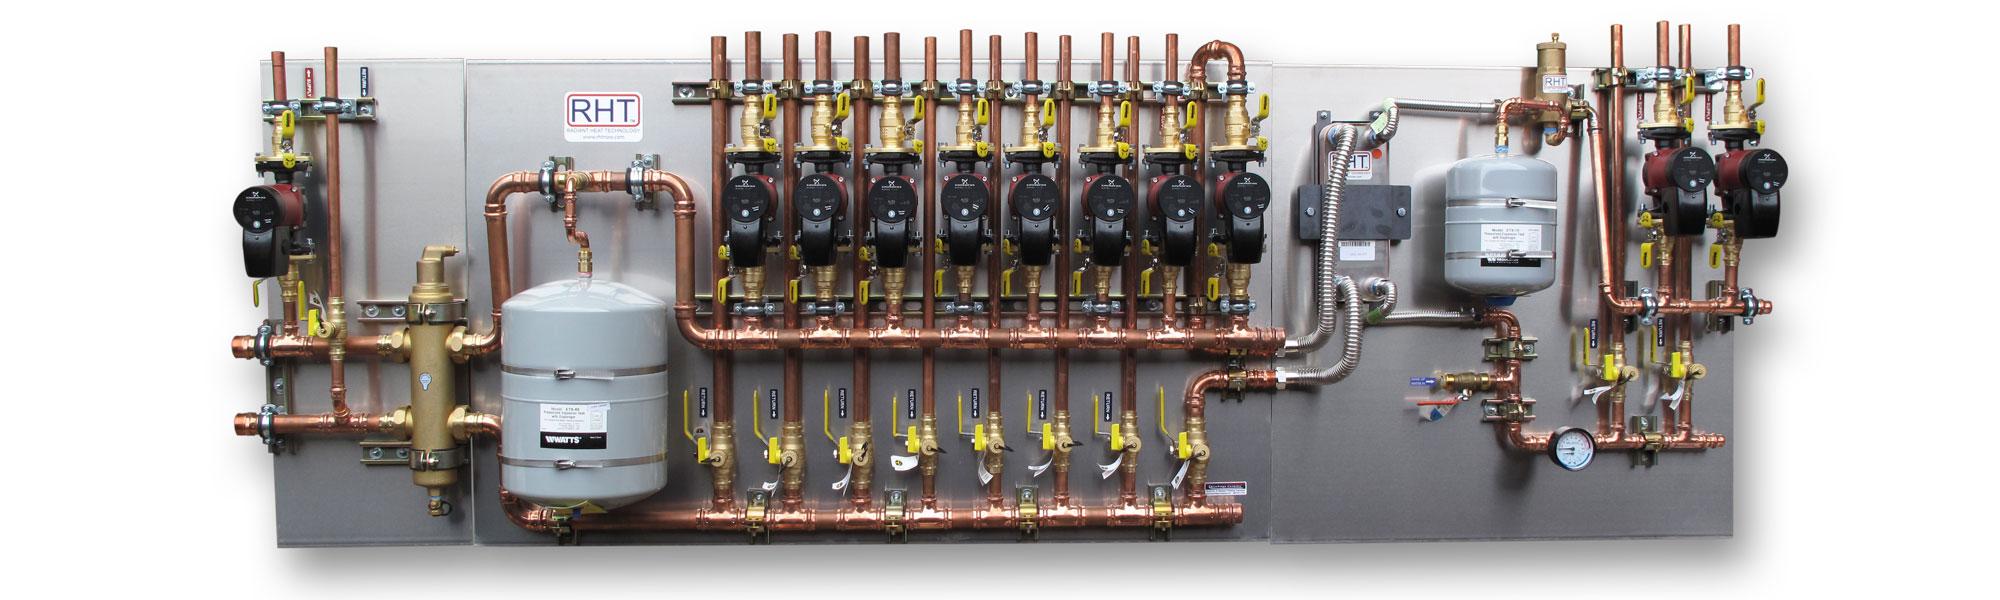 hight resolution of zone valve wiring floor heat